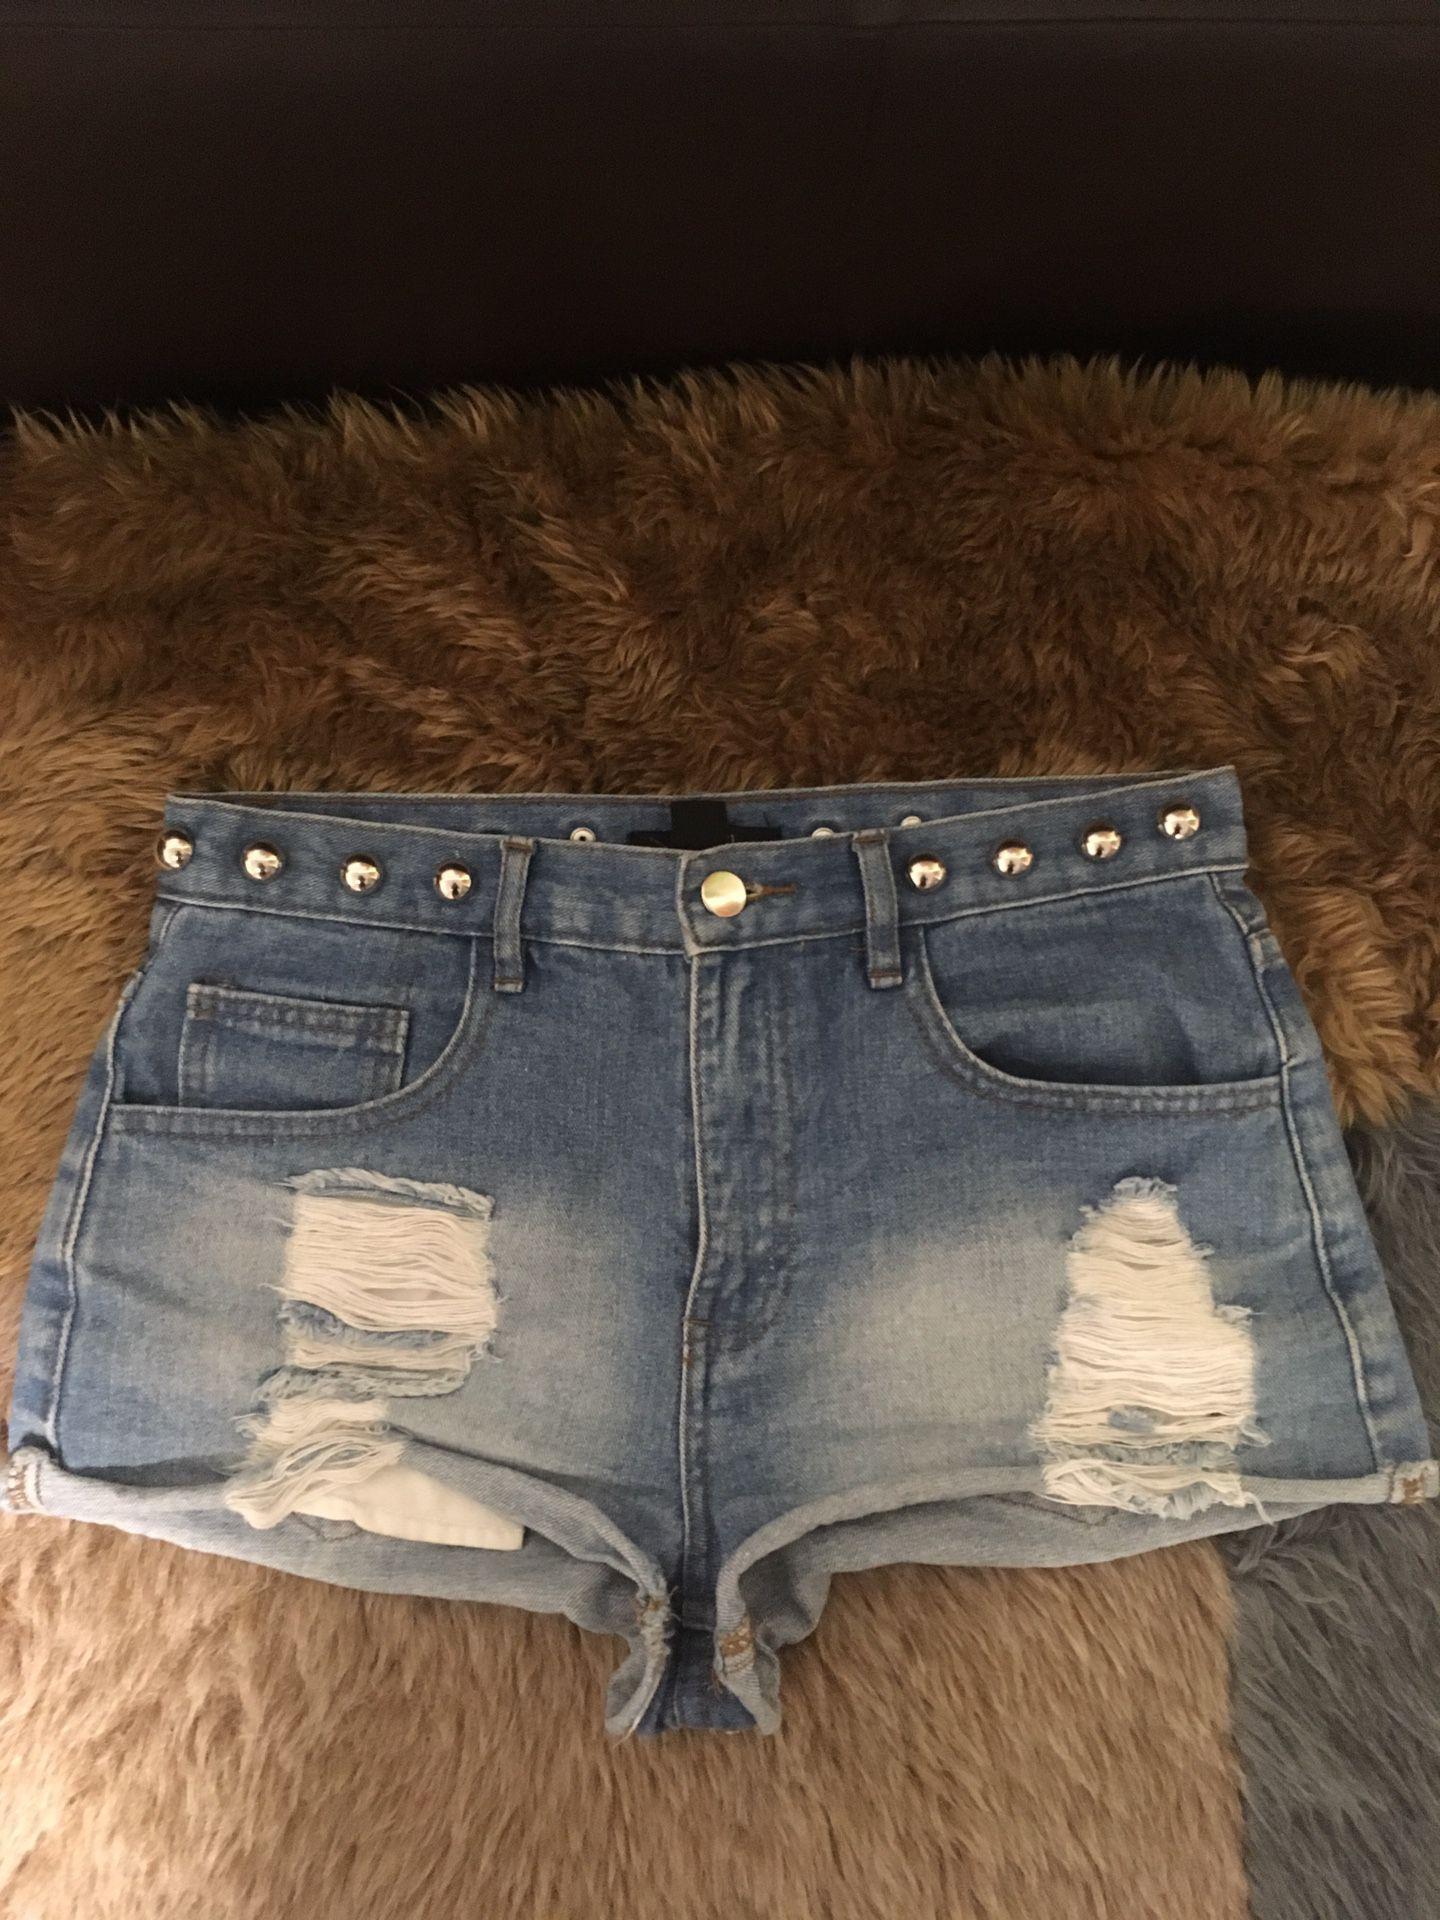 Size 27 high waisted shorts